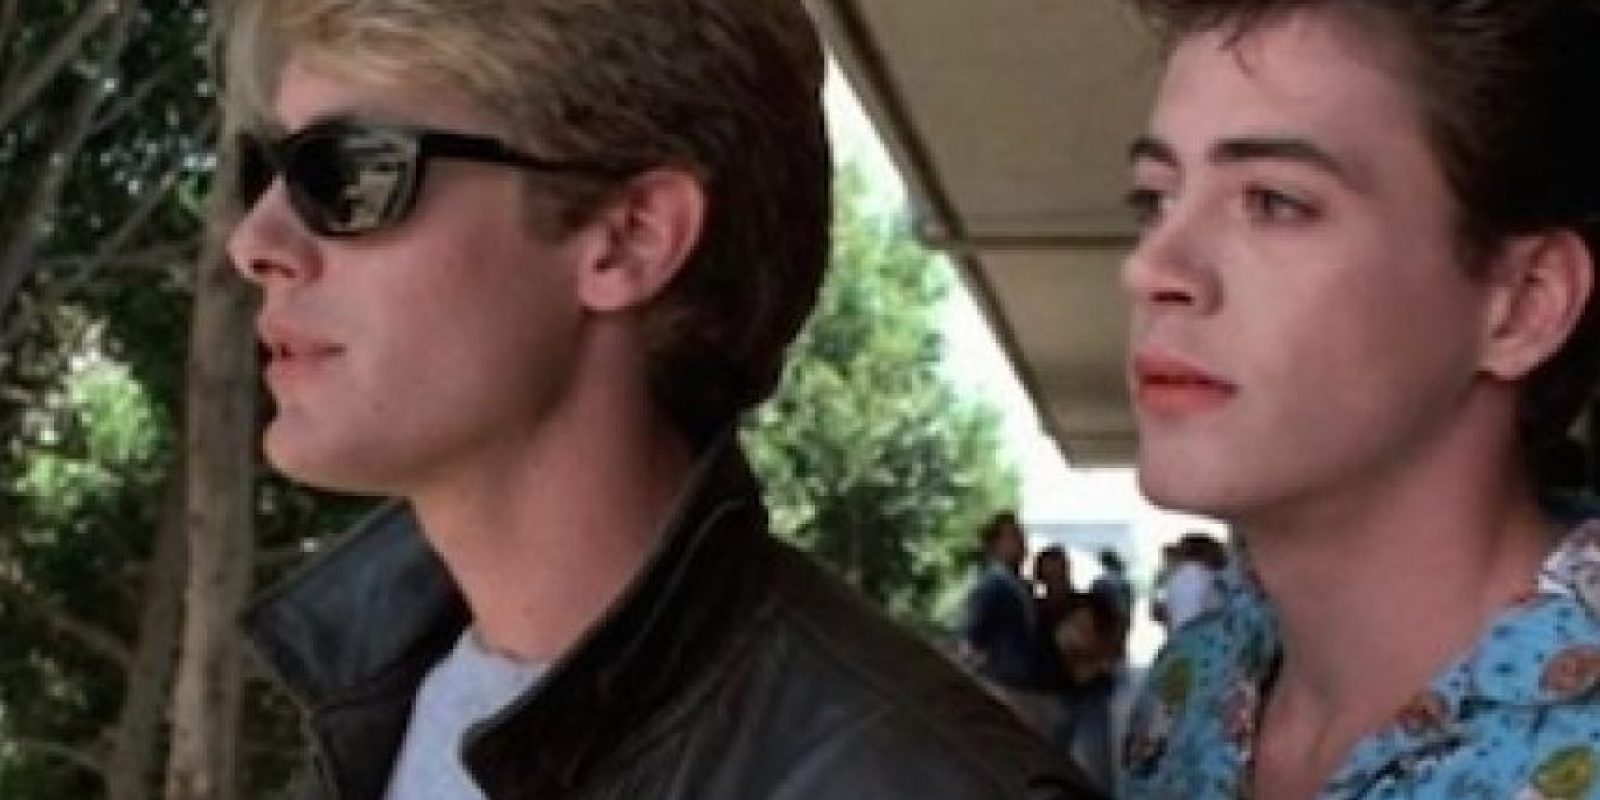 Robert Downey Jr. recordó su juventud Foto:Facebook/RobertDowneyJr